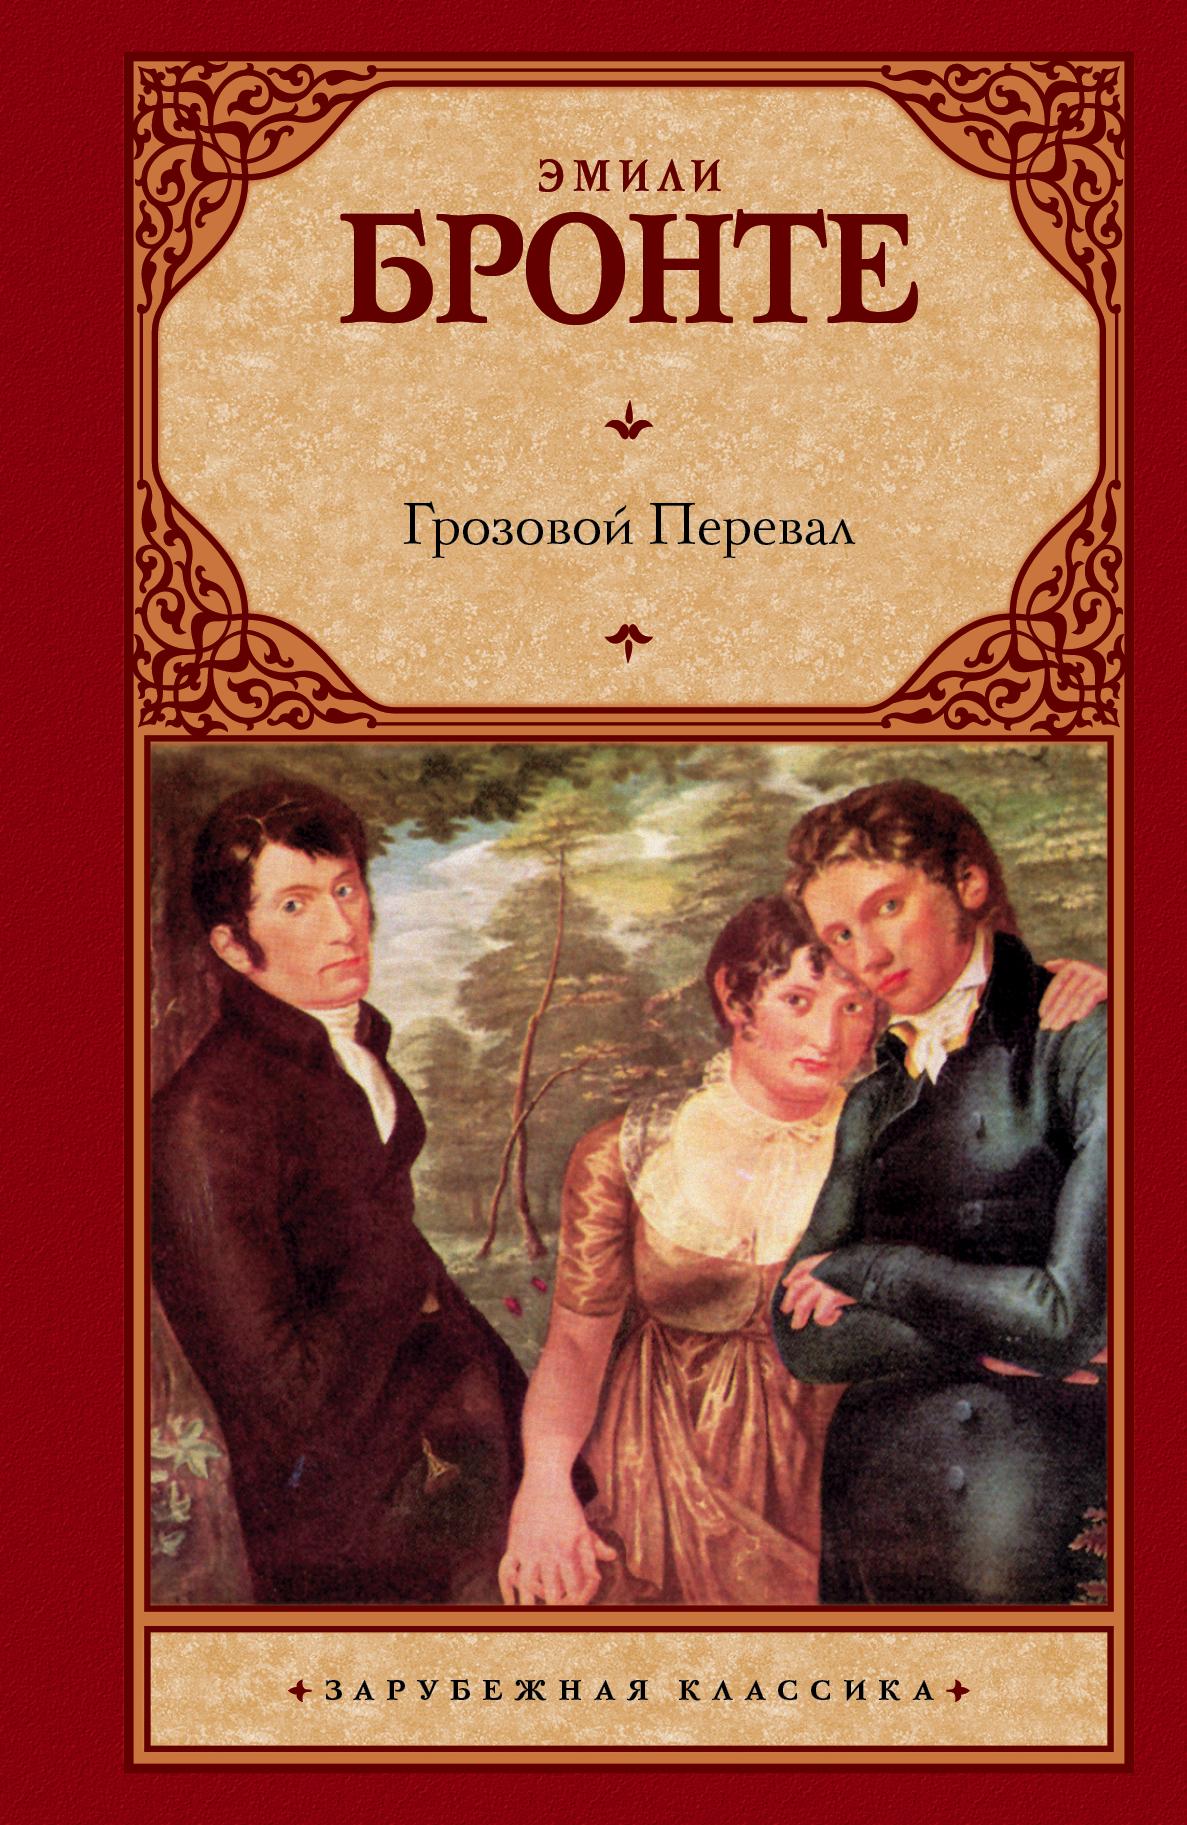 Бронте Э. Грозовой перевал ISBN: 978-5-17-063706-5 bronte e wuthering heights грозовой перевал роман на англ яз